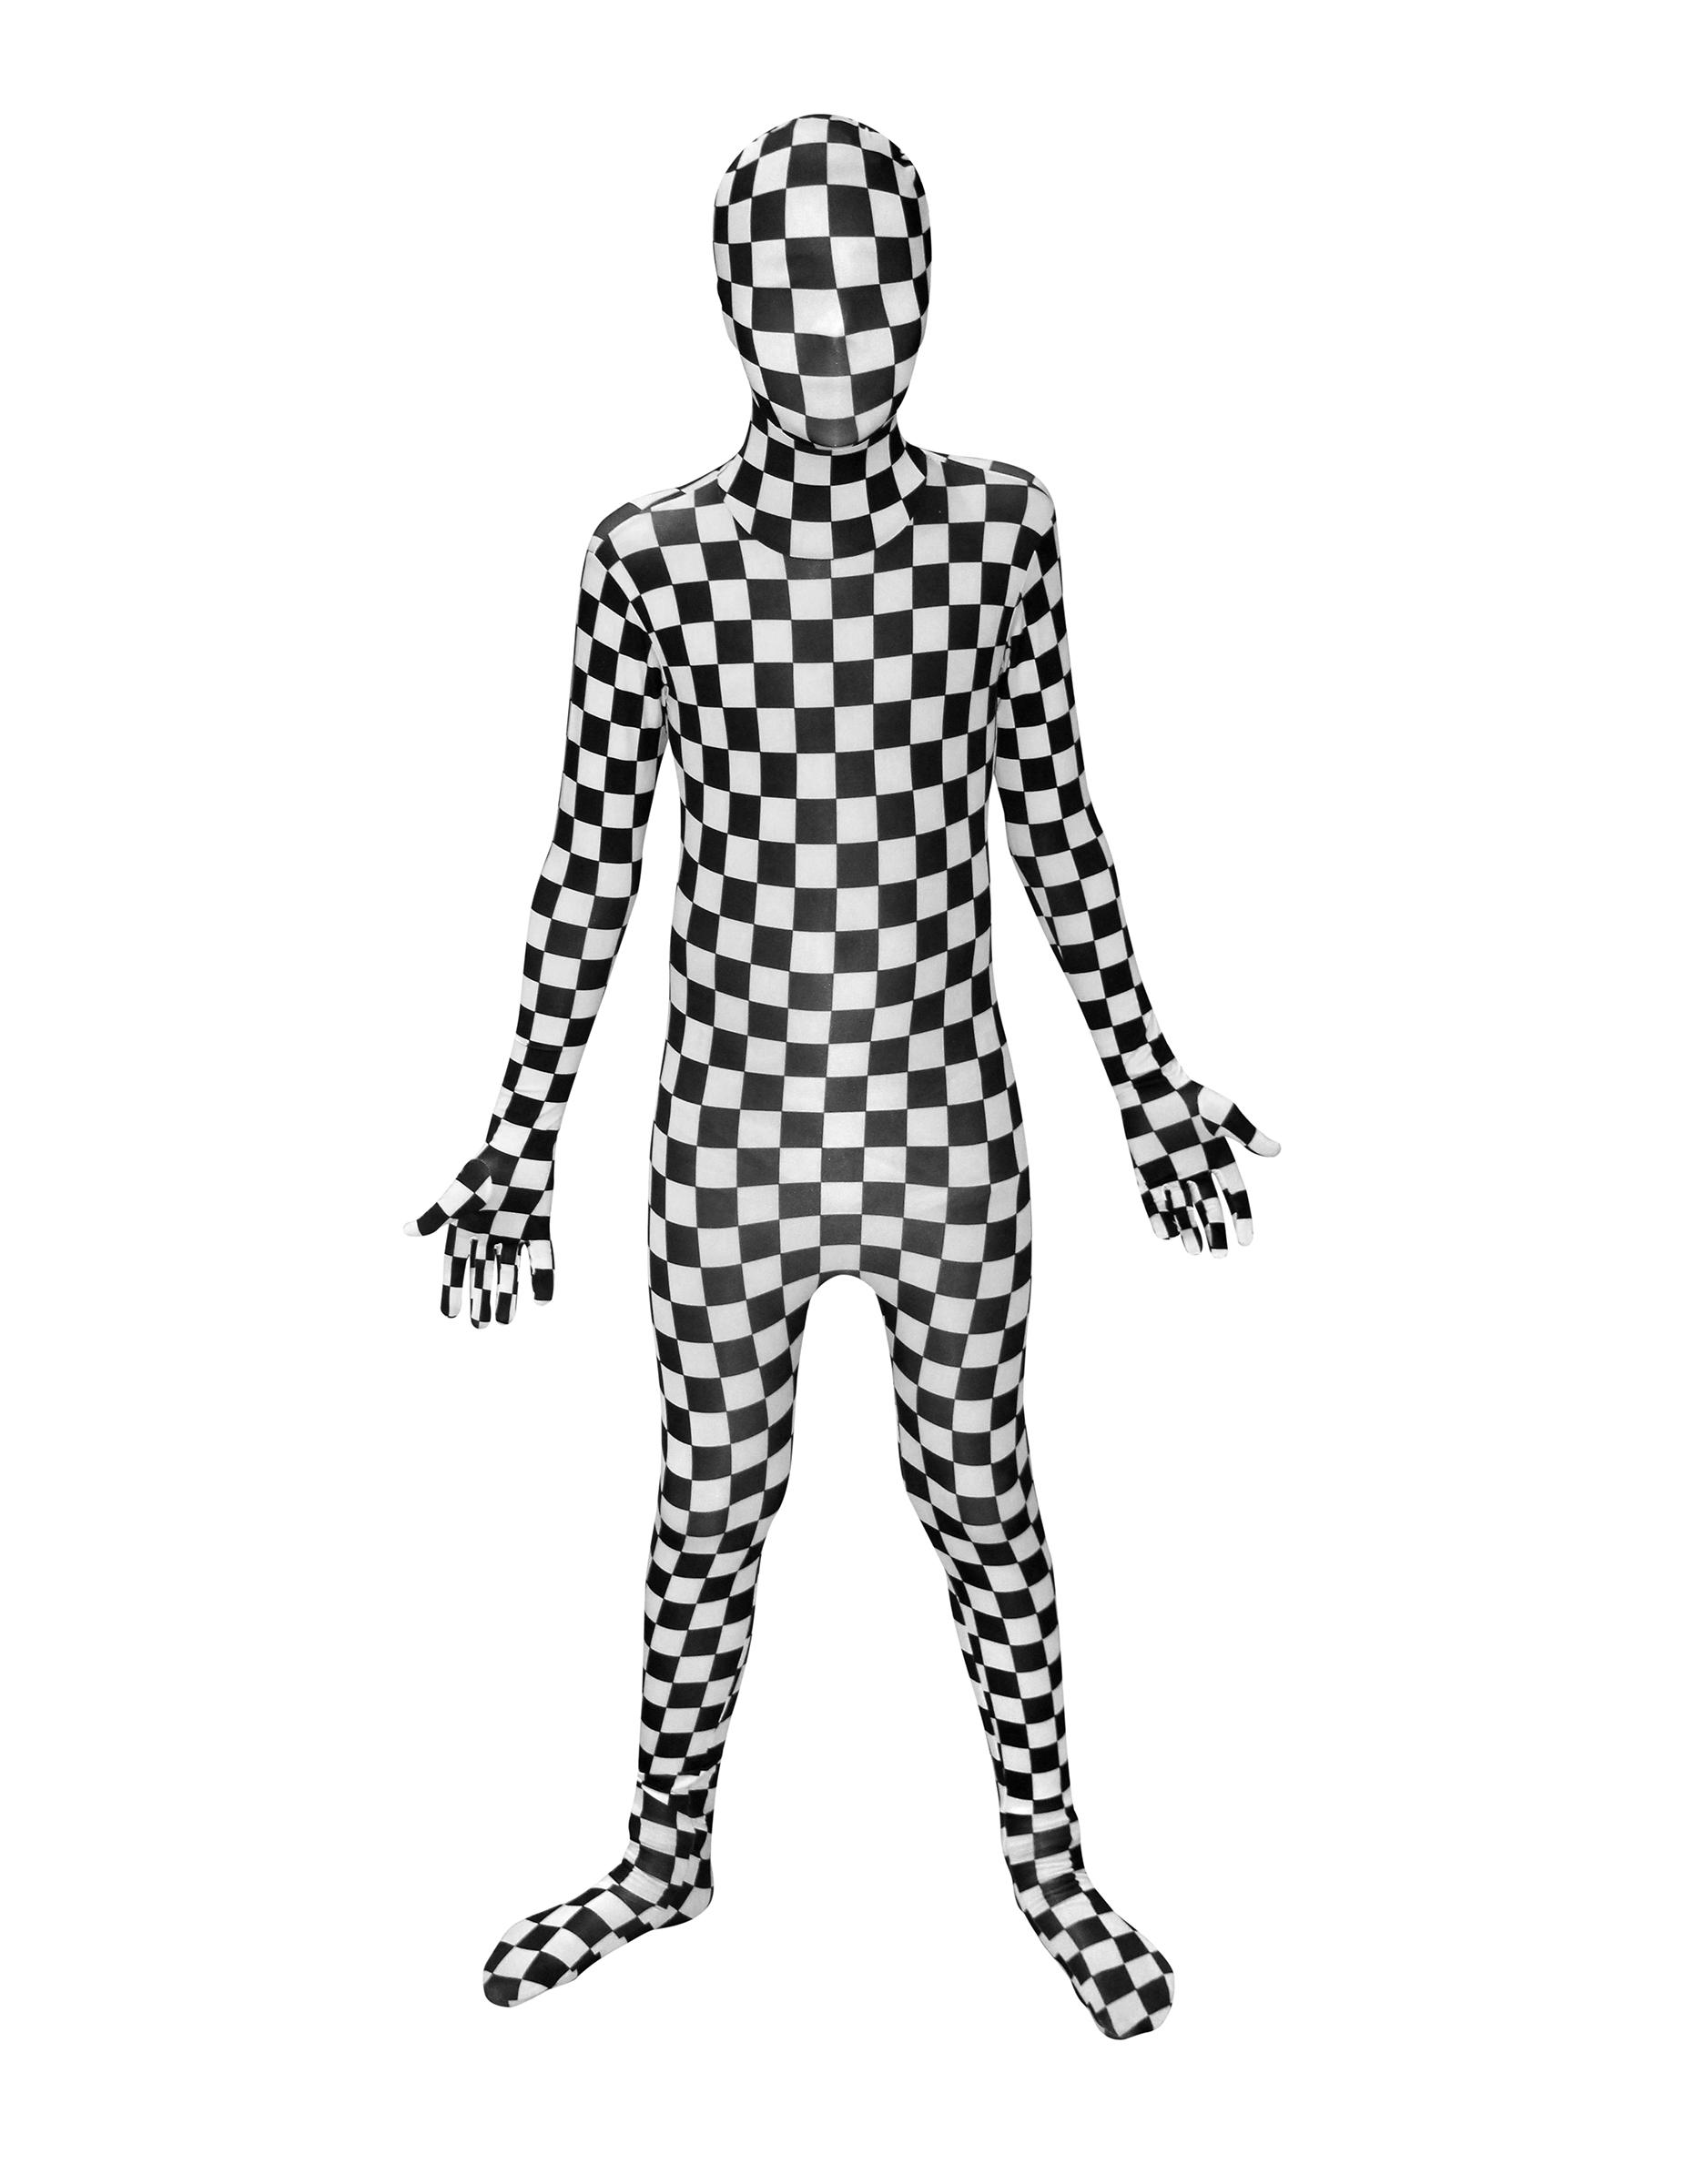 Karo Kinder Morphsuit Schwarz Weiss Gunstige Faschings Kostume Bei